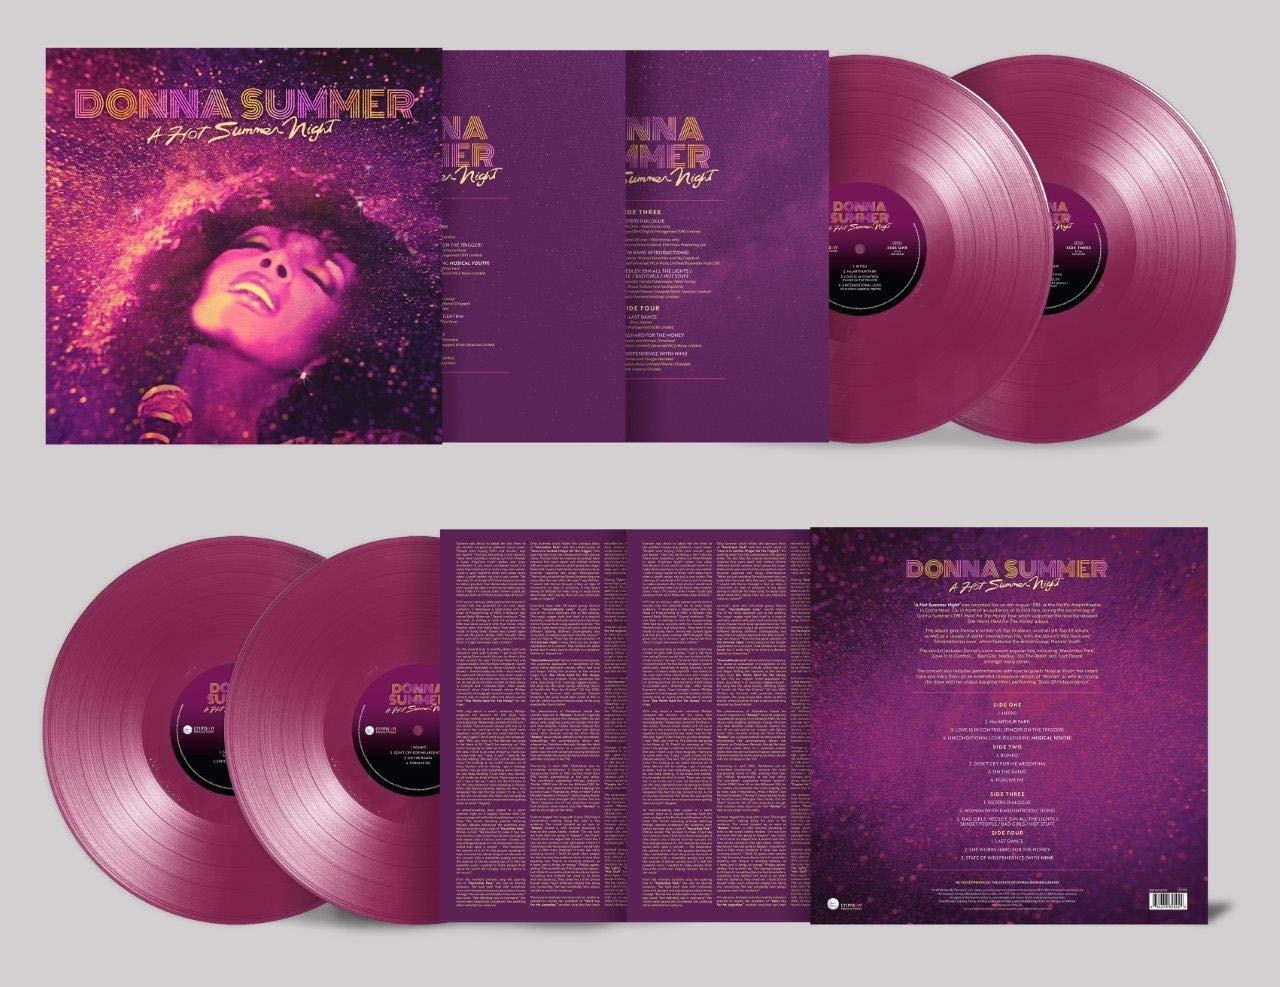 Donna Summer - A Hot Summer Night [Ed Limitada - Double Purple Vinyl]